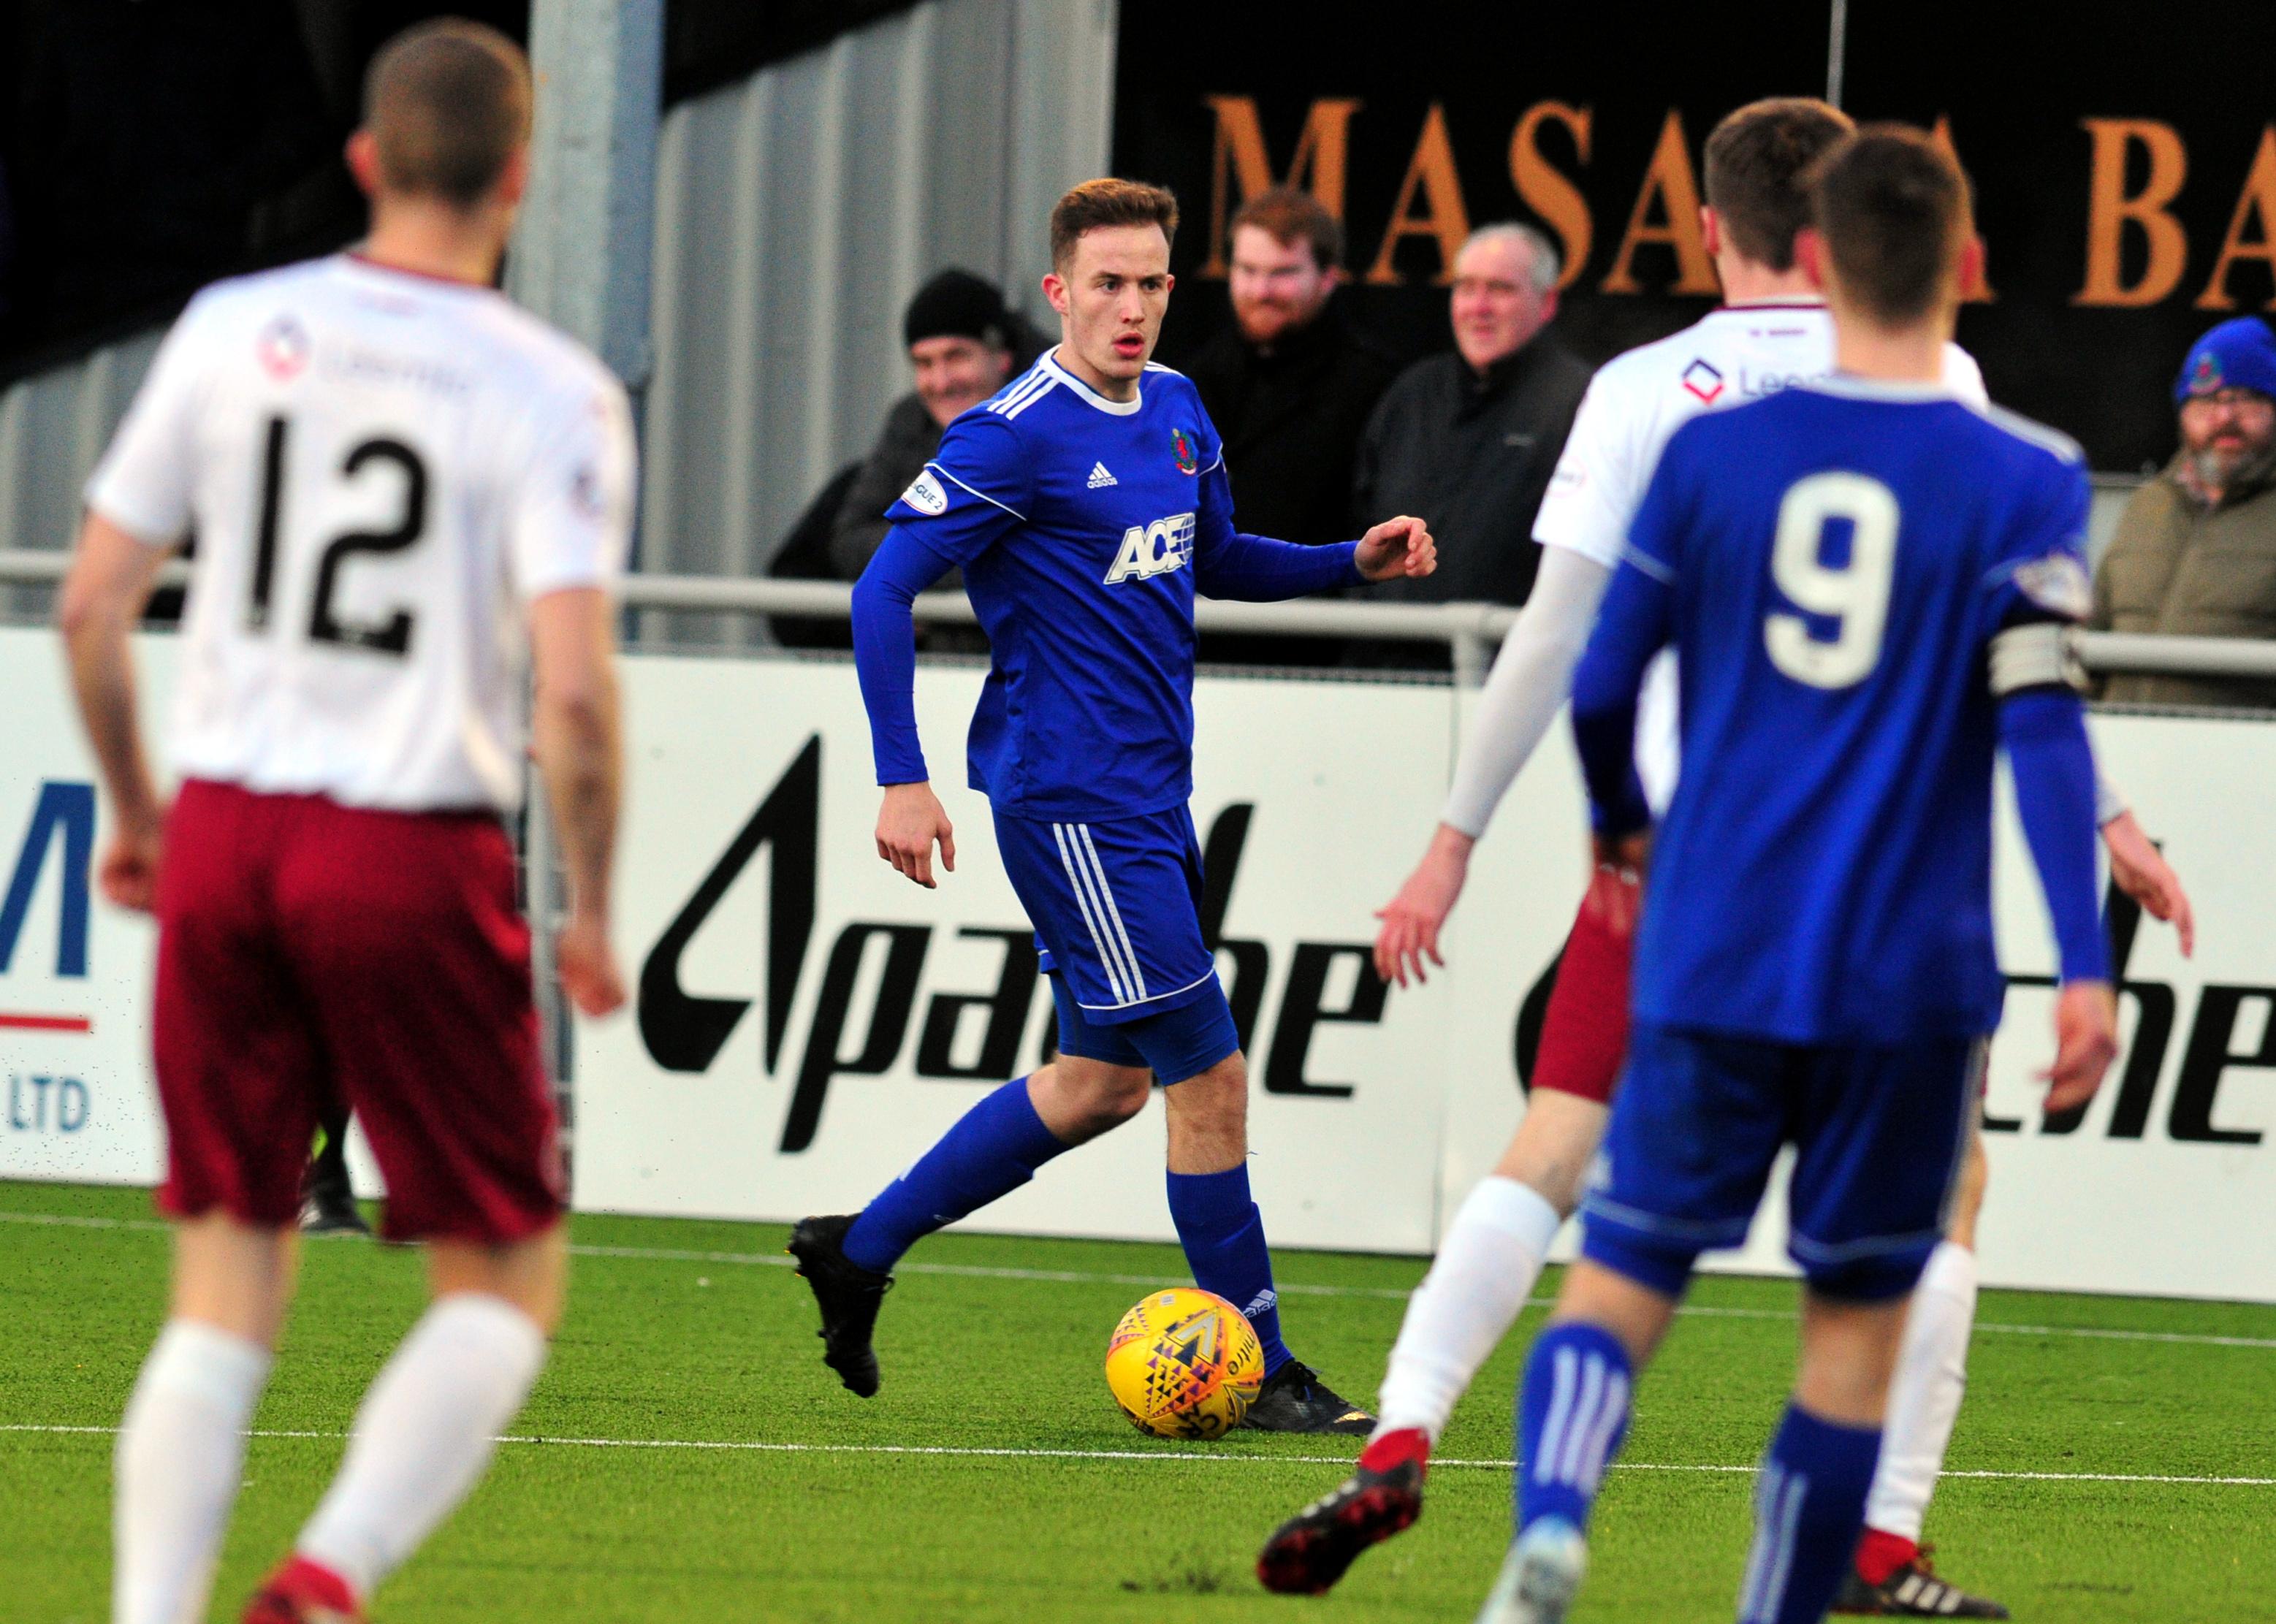 Cove Rangers defender Tom Leighton